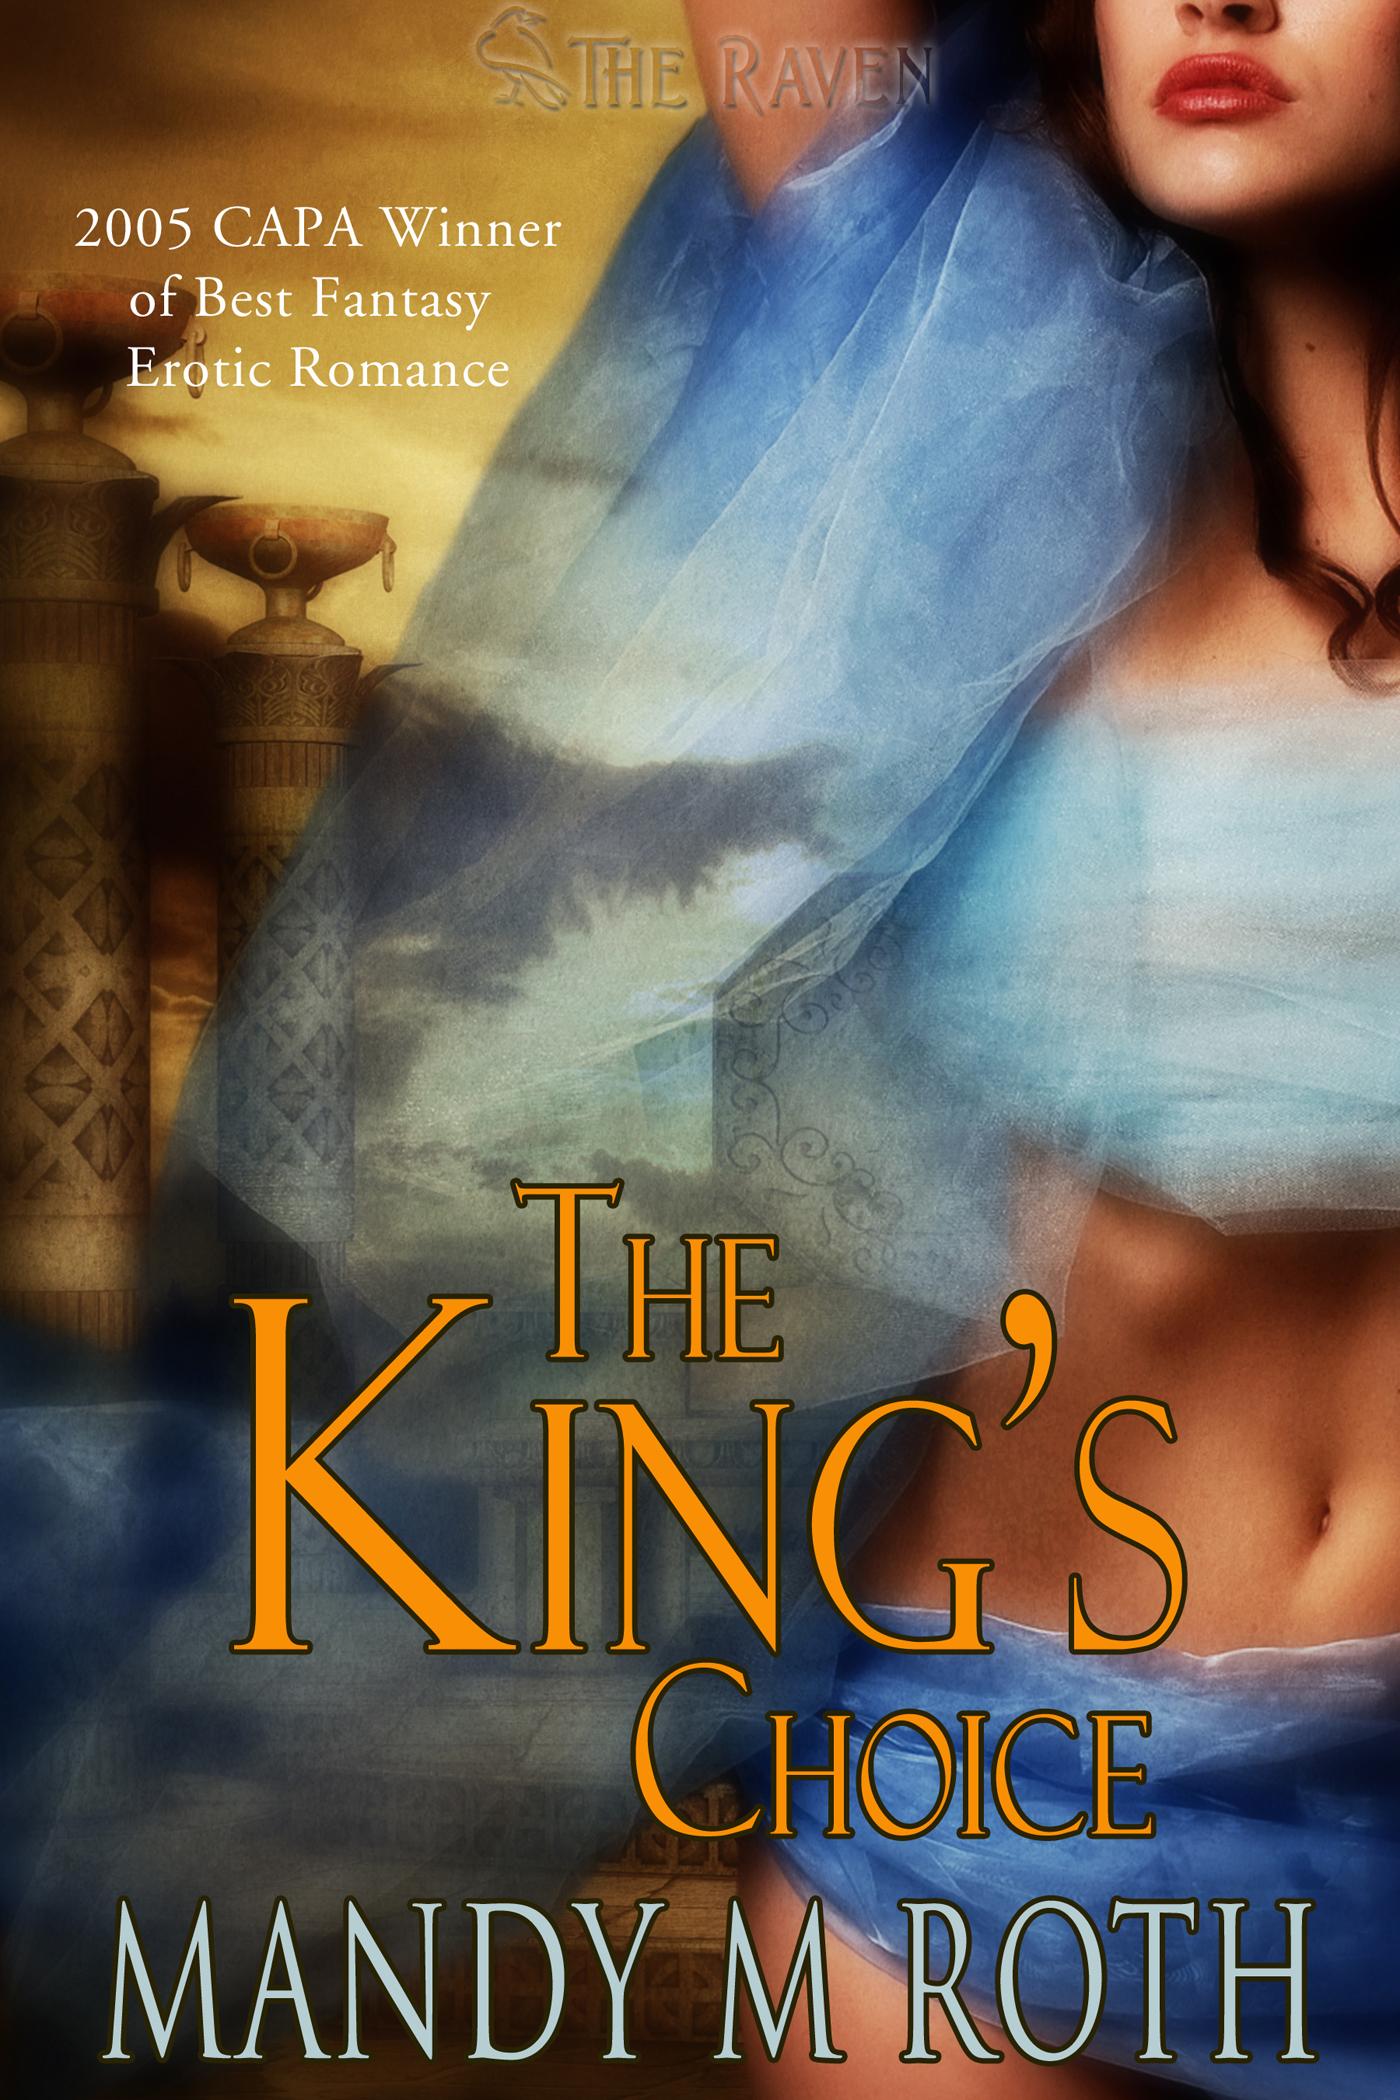 Mandy M. Roth - The King's Choice (King's Choice I)